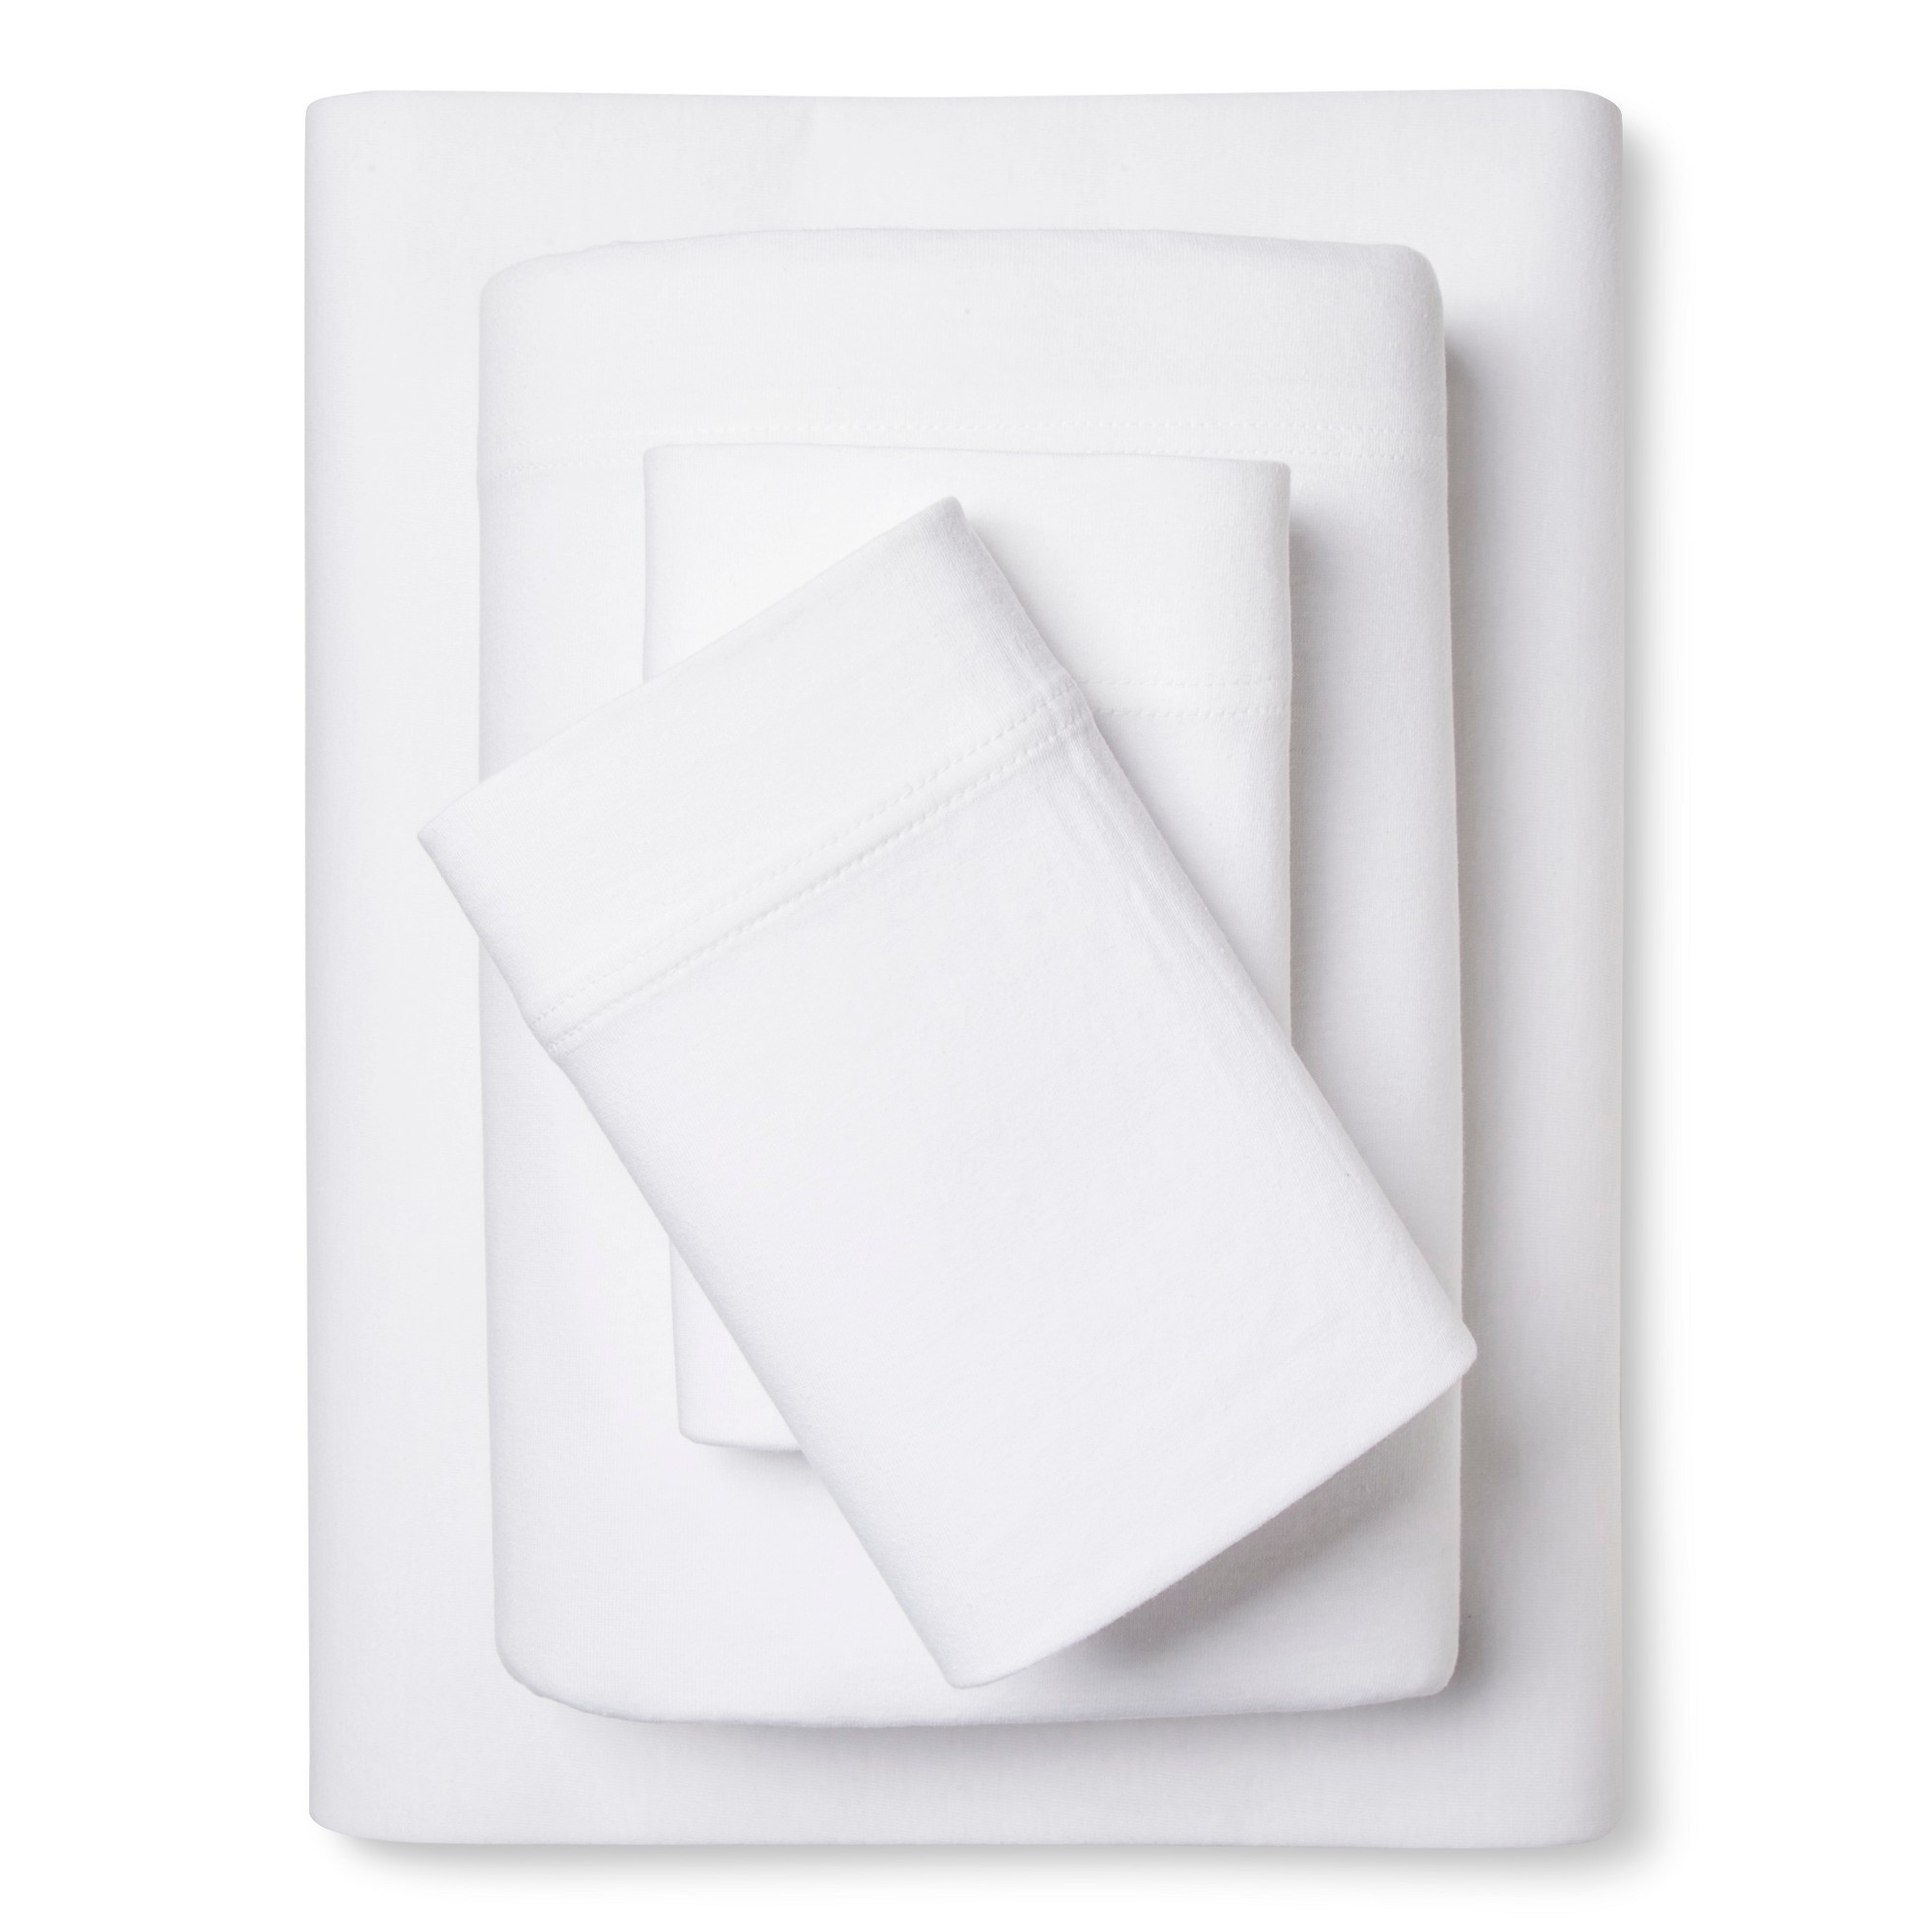 Jersey Sheet Set - (Full) White - Room Essentials